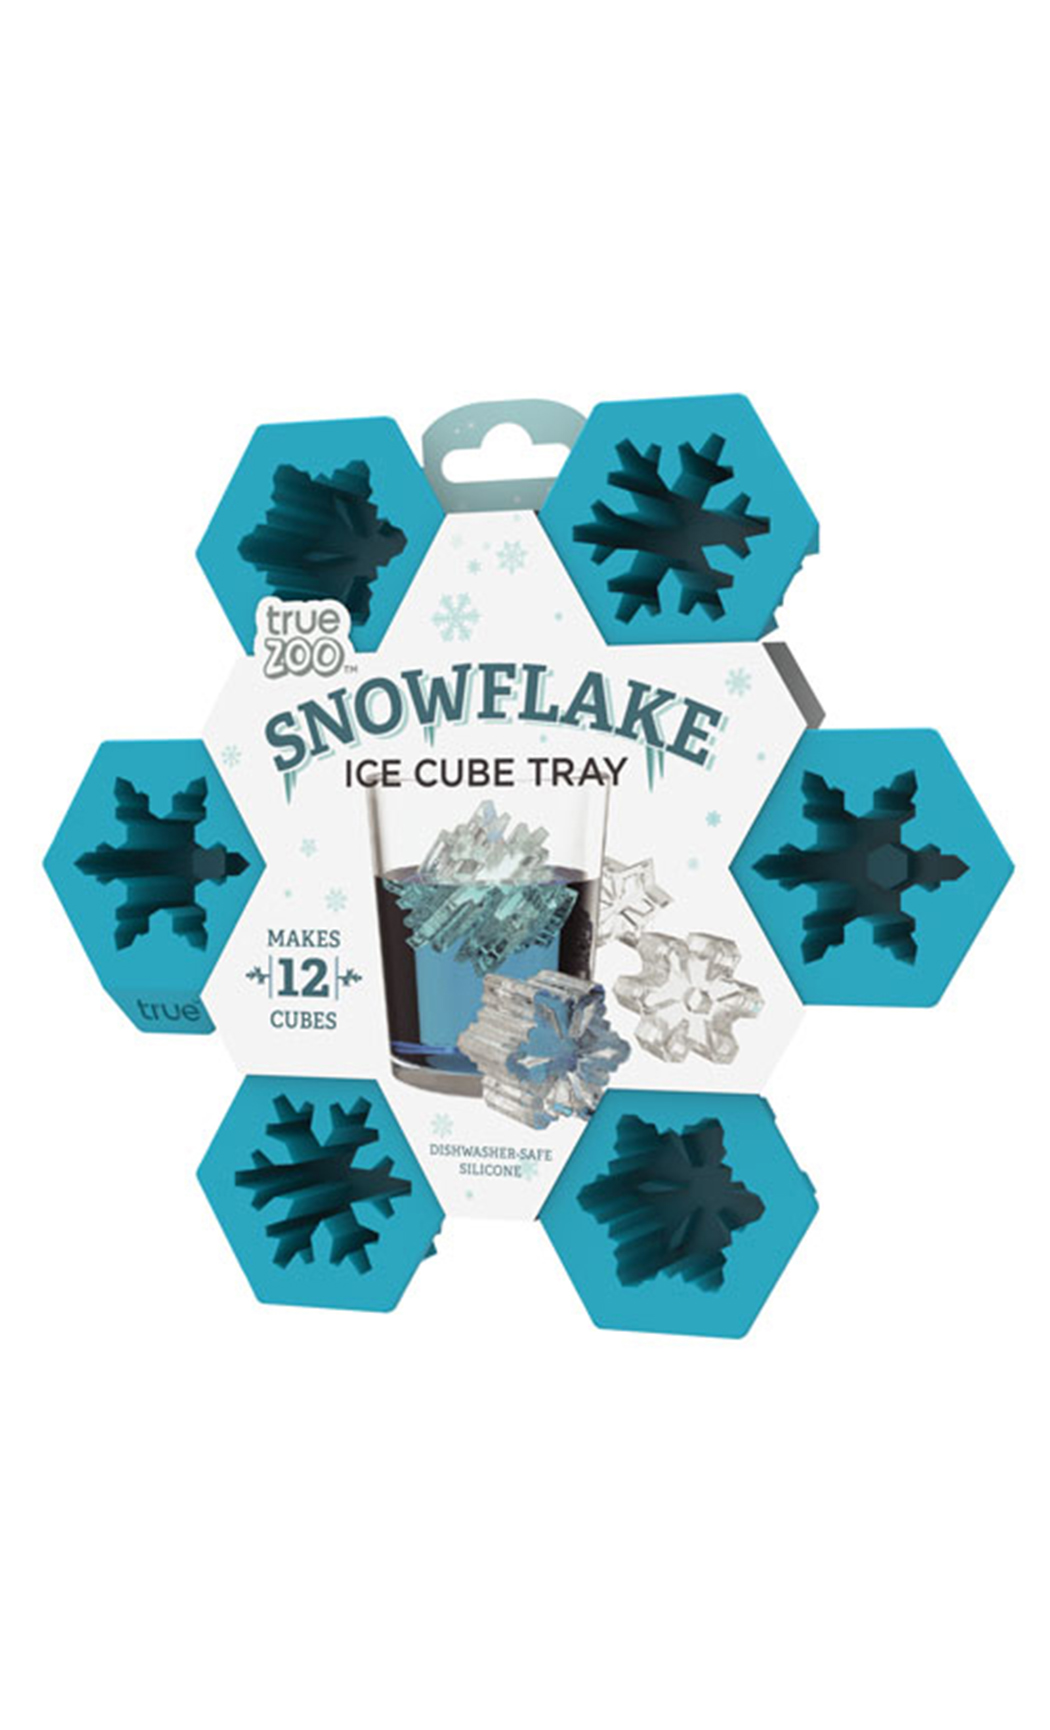 Snowflake Ice Cube Tray